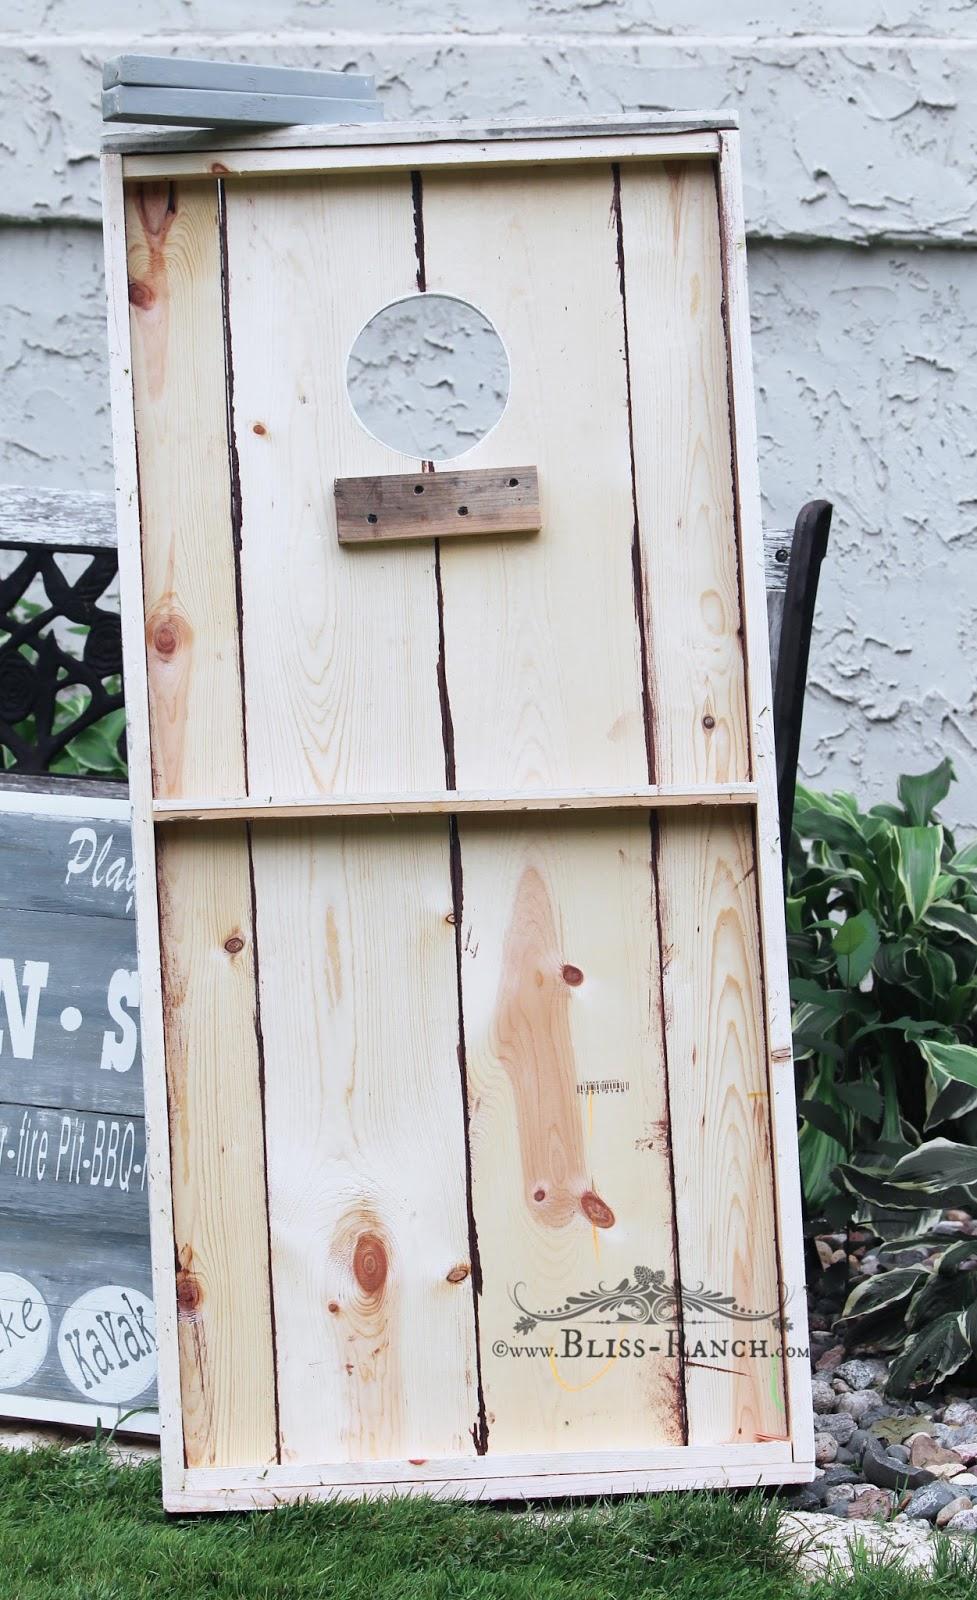 Bean Bag Toss Yard Game Bliss-Ranch.com #maisonblanchepaint  #paintedfurniture #ad